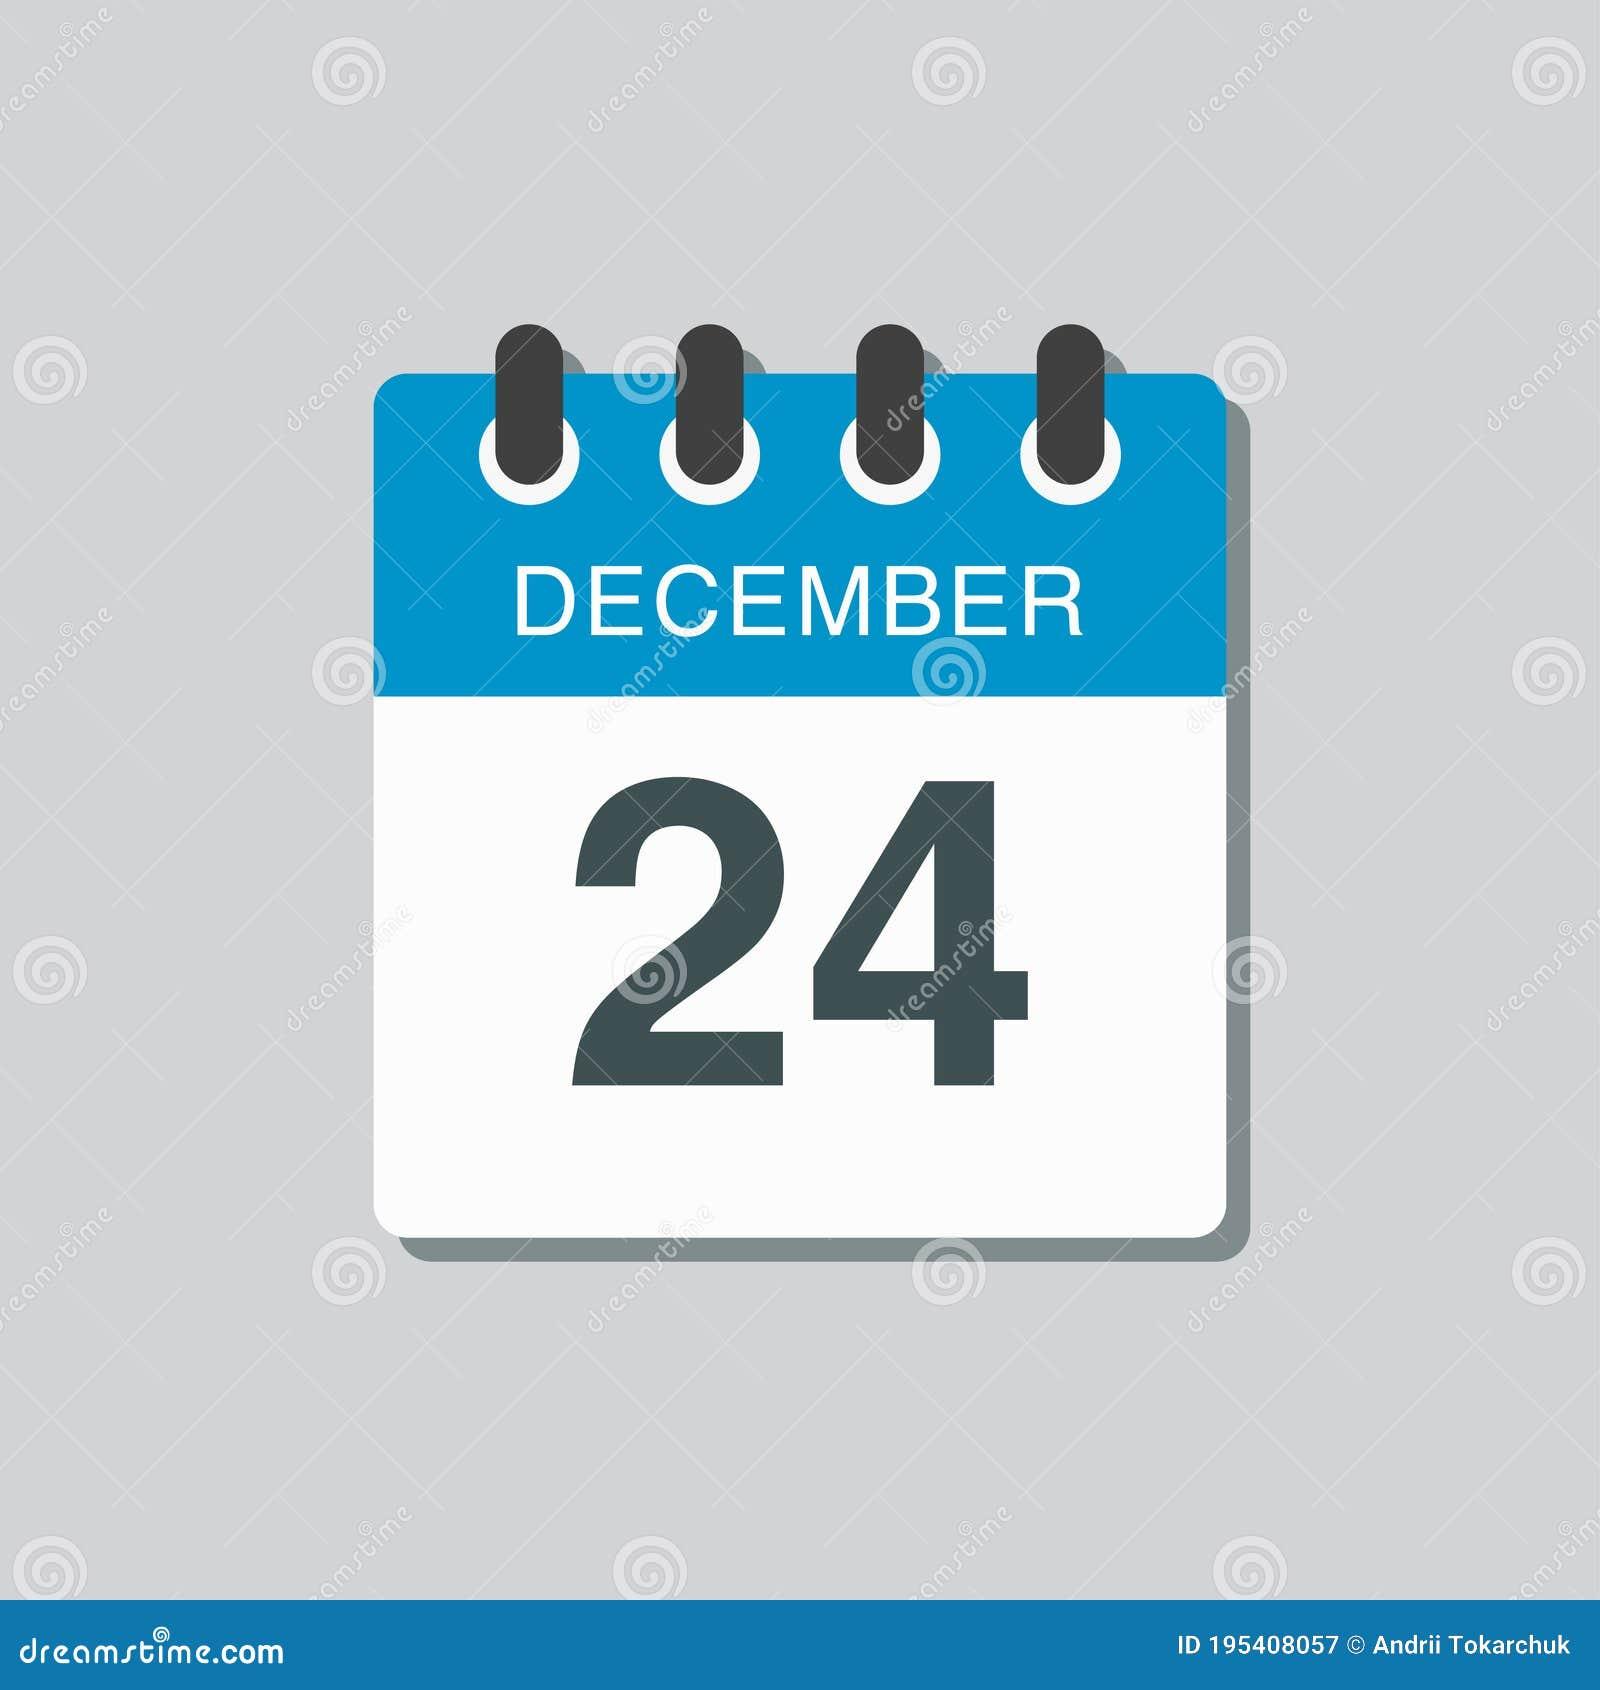 December 24th Stock Illustrations – 114 December 24th Stock Illustrations,  Vectors & Clipart - Dreamstime